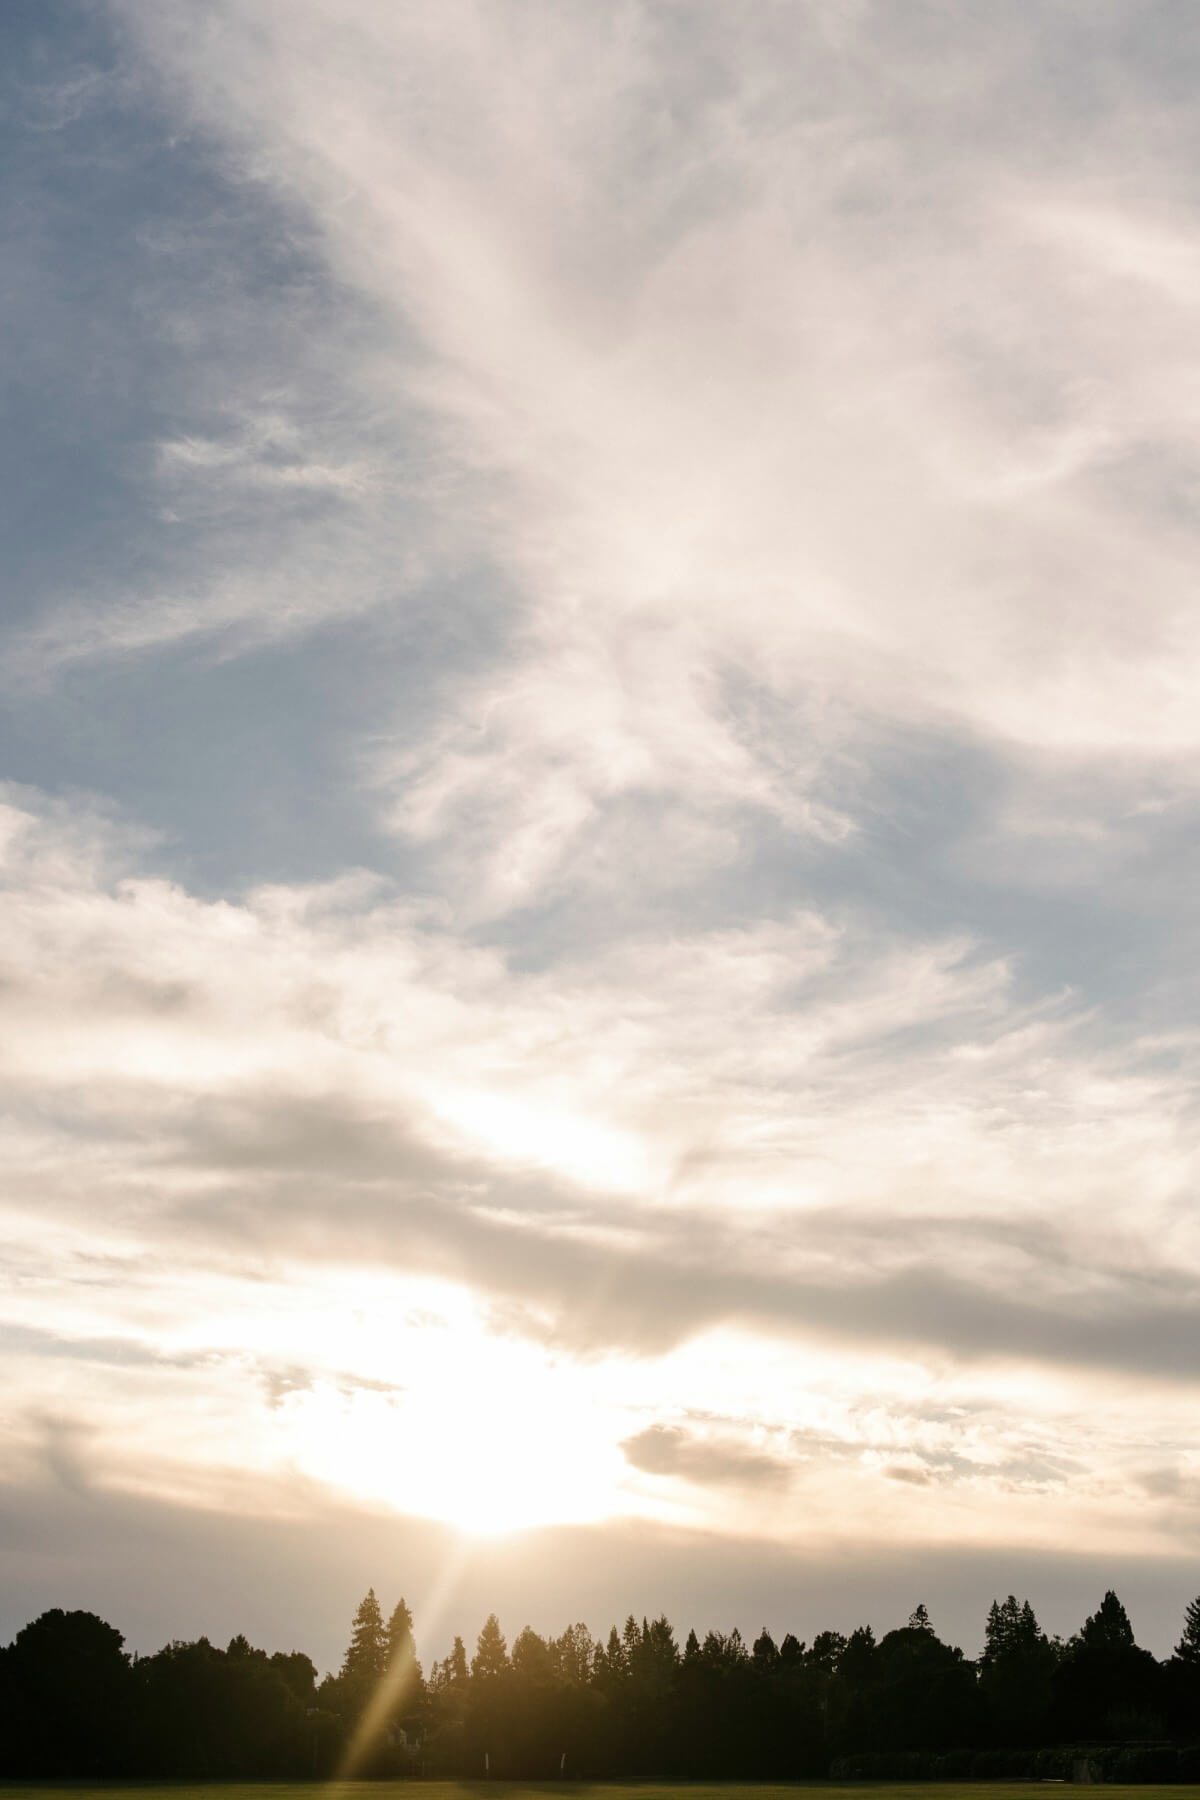 Melanie Duerkopp, Northern California Wedding Photographer, Melanie Duerkopp Photography, pastel wedding, sparkle, outdoor wedding, Bay Area wedding photographer, Menlo Park, classic, elegant, black tie, Menlo Park wedding, Garden Court Hotel, Menlo Circus Club, Suzy Somers, Flower Divas, La Tavola, Tomfoolery